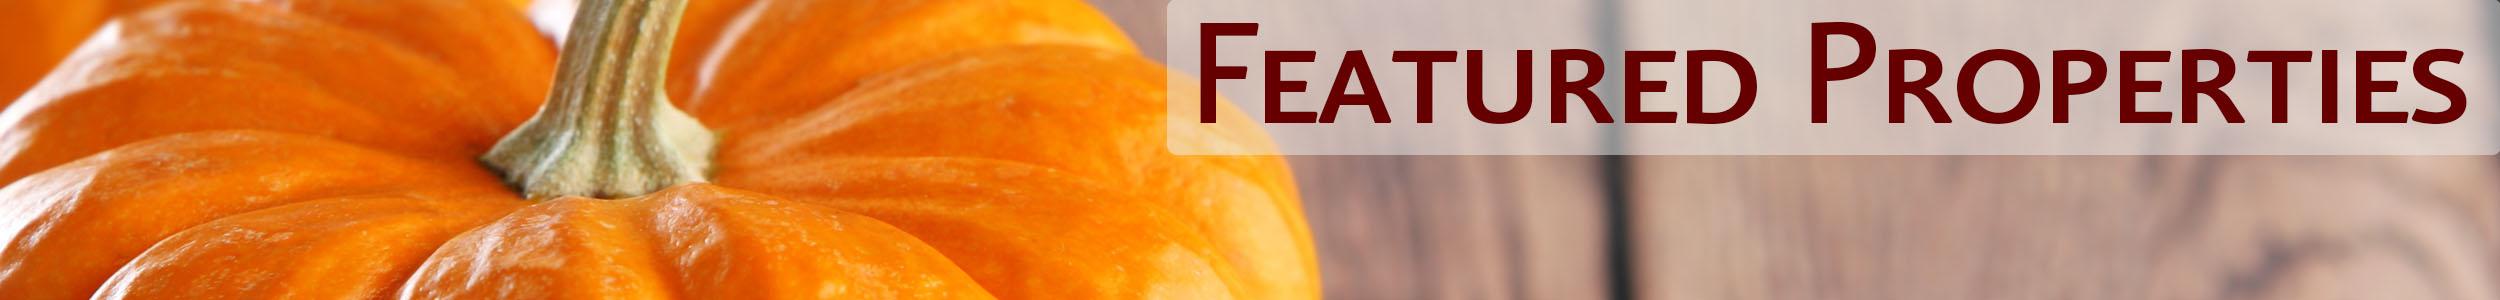 Featured Properties The Gary Blattberg Team - Fall 2019